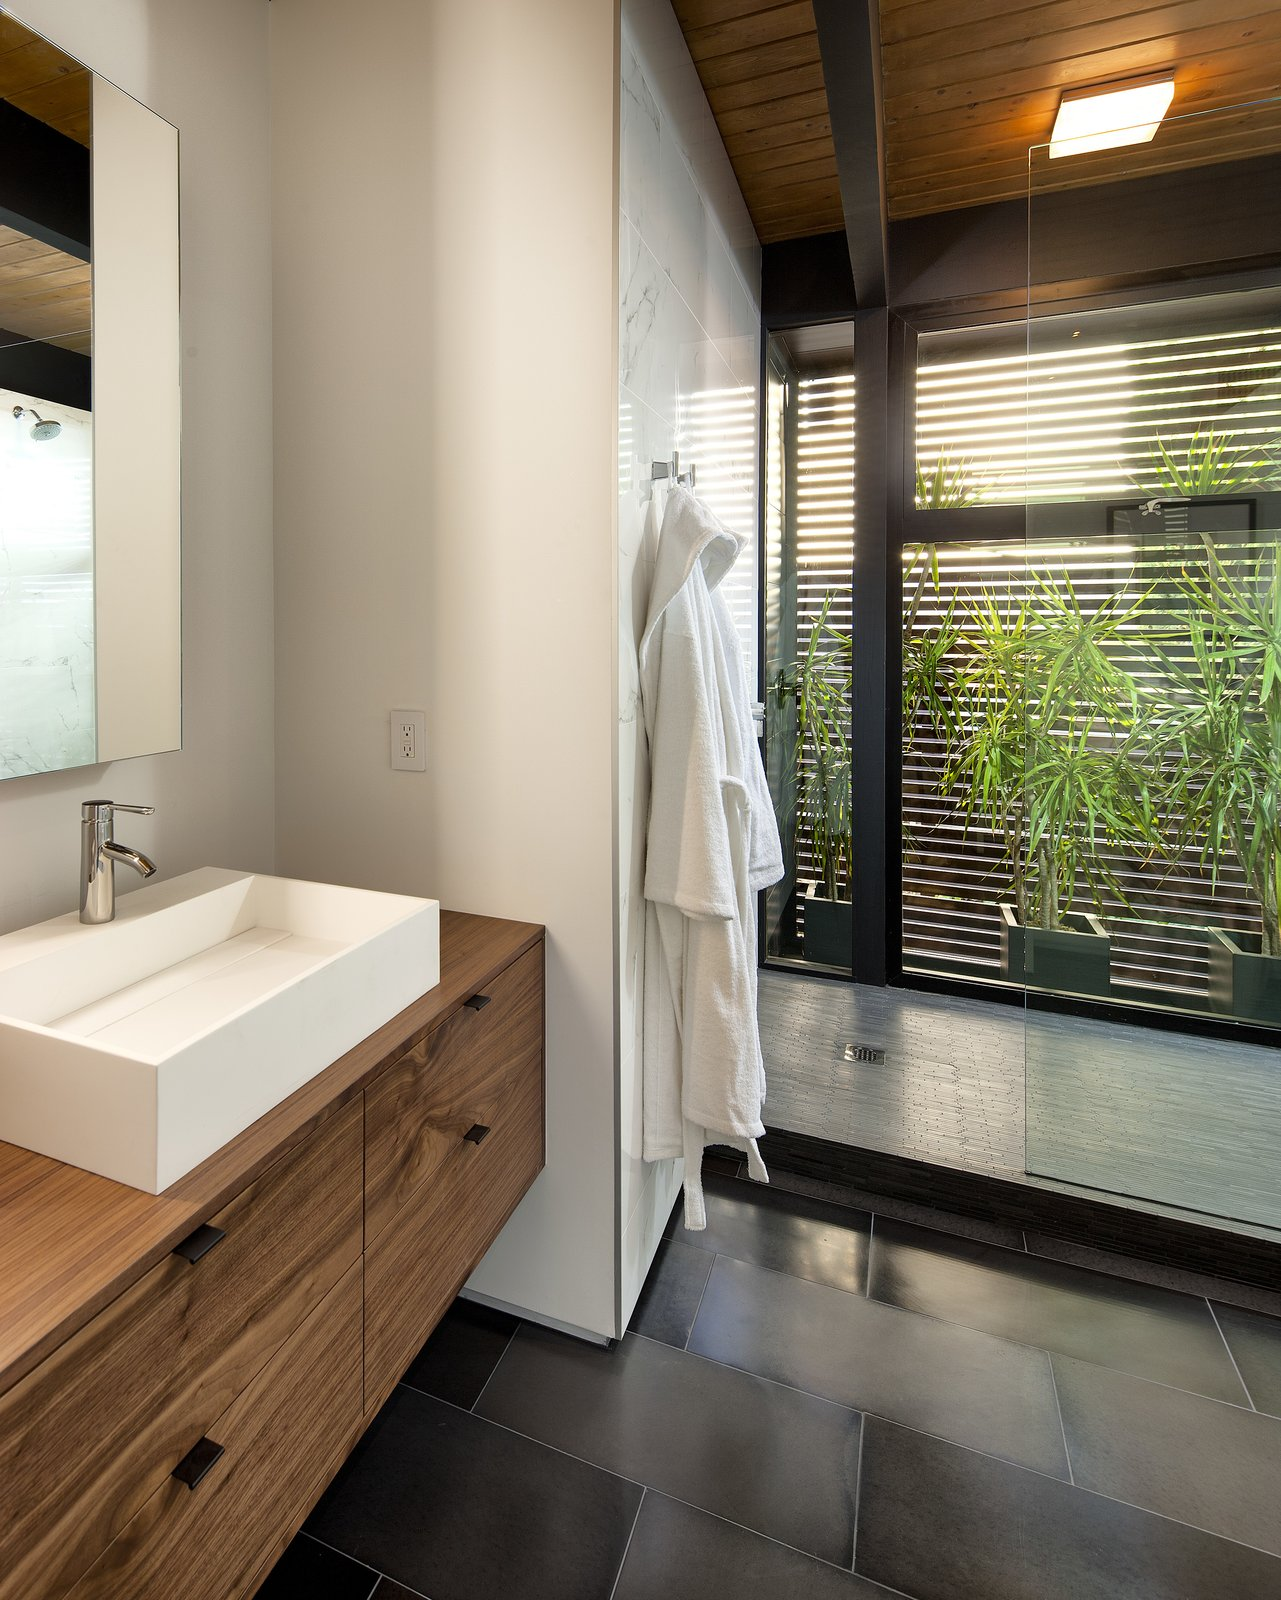 Bath Room, Wood Counter, Cement Tile Floor, Vessel Sink, Corner Shower, Ceiling Lighting, and Open Shower  Paseo Ferrelo